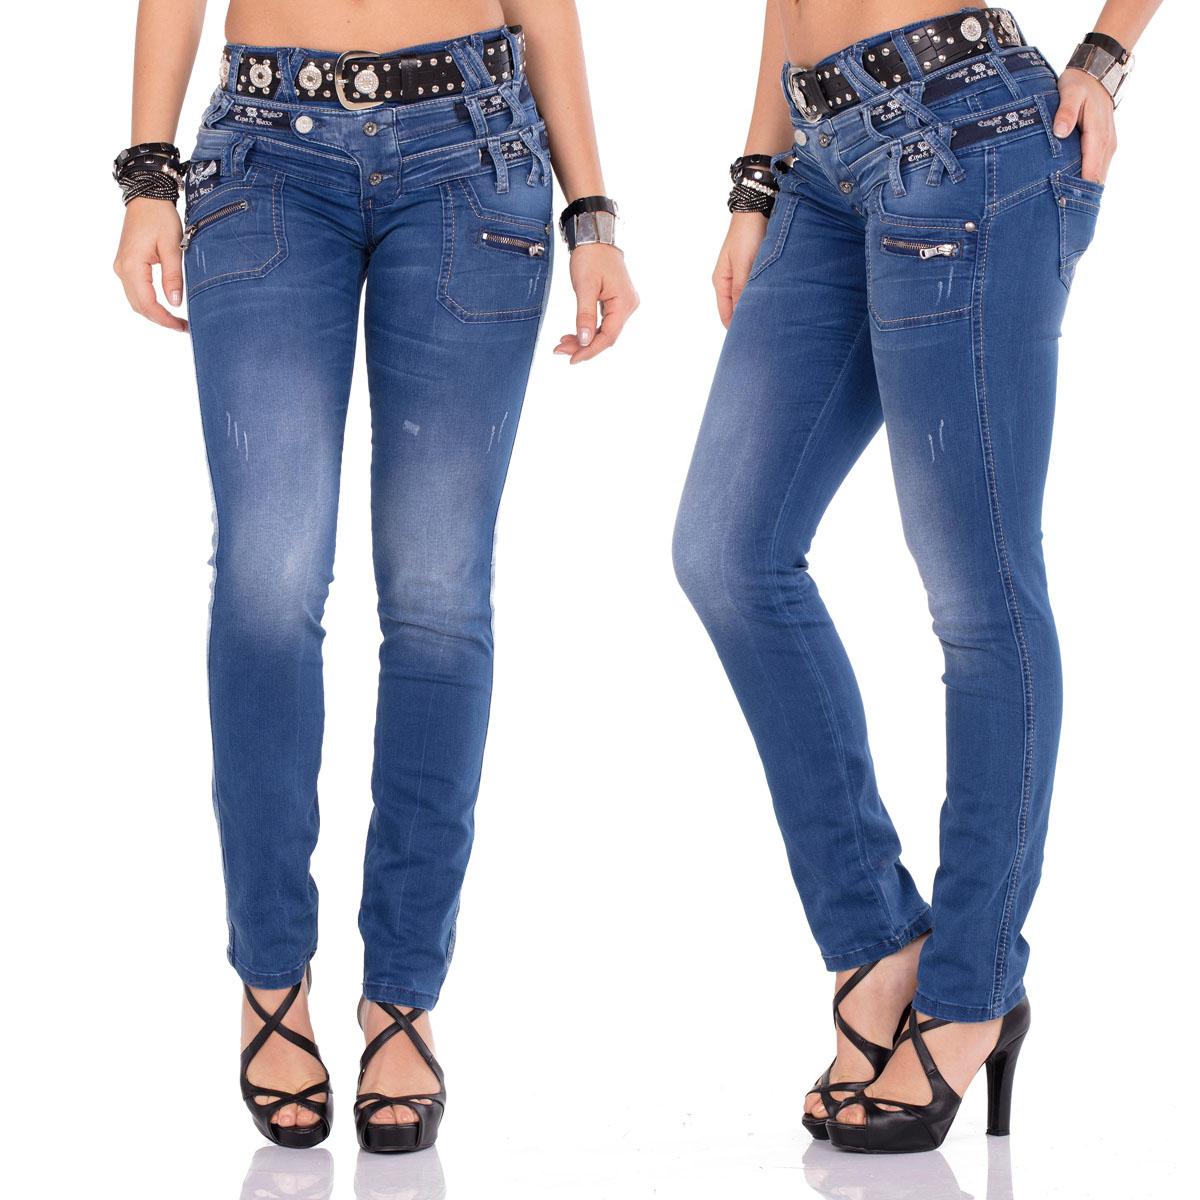 CIPO /& BAXX Damen Jeans CBW-347A hellblau Slim Fit Skinny mit oder ohne Gürtel